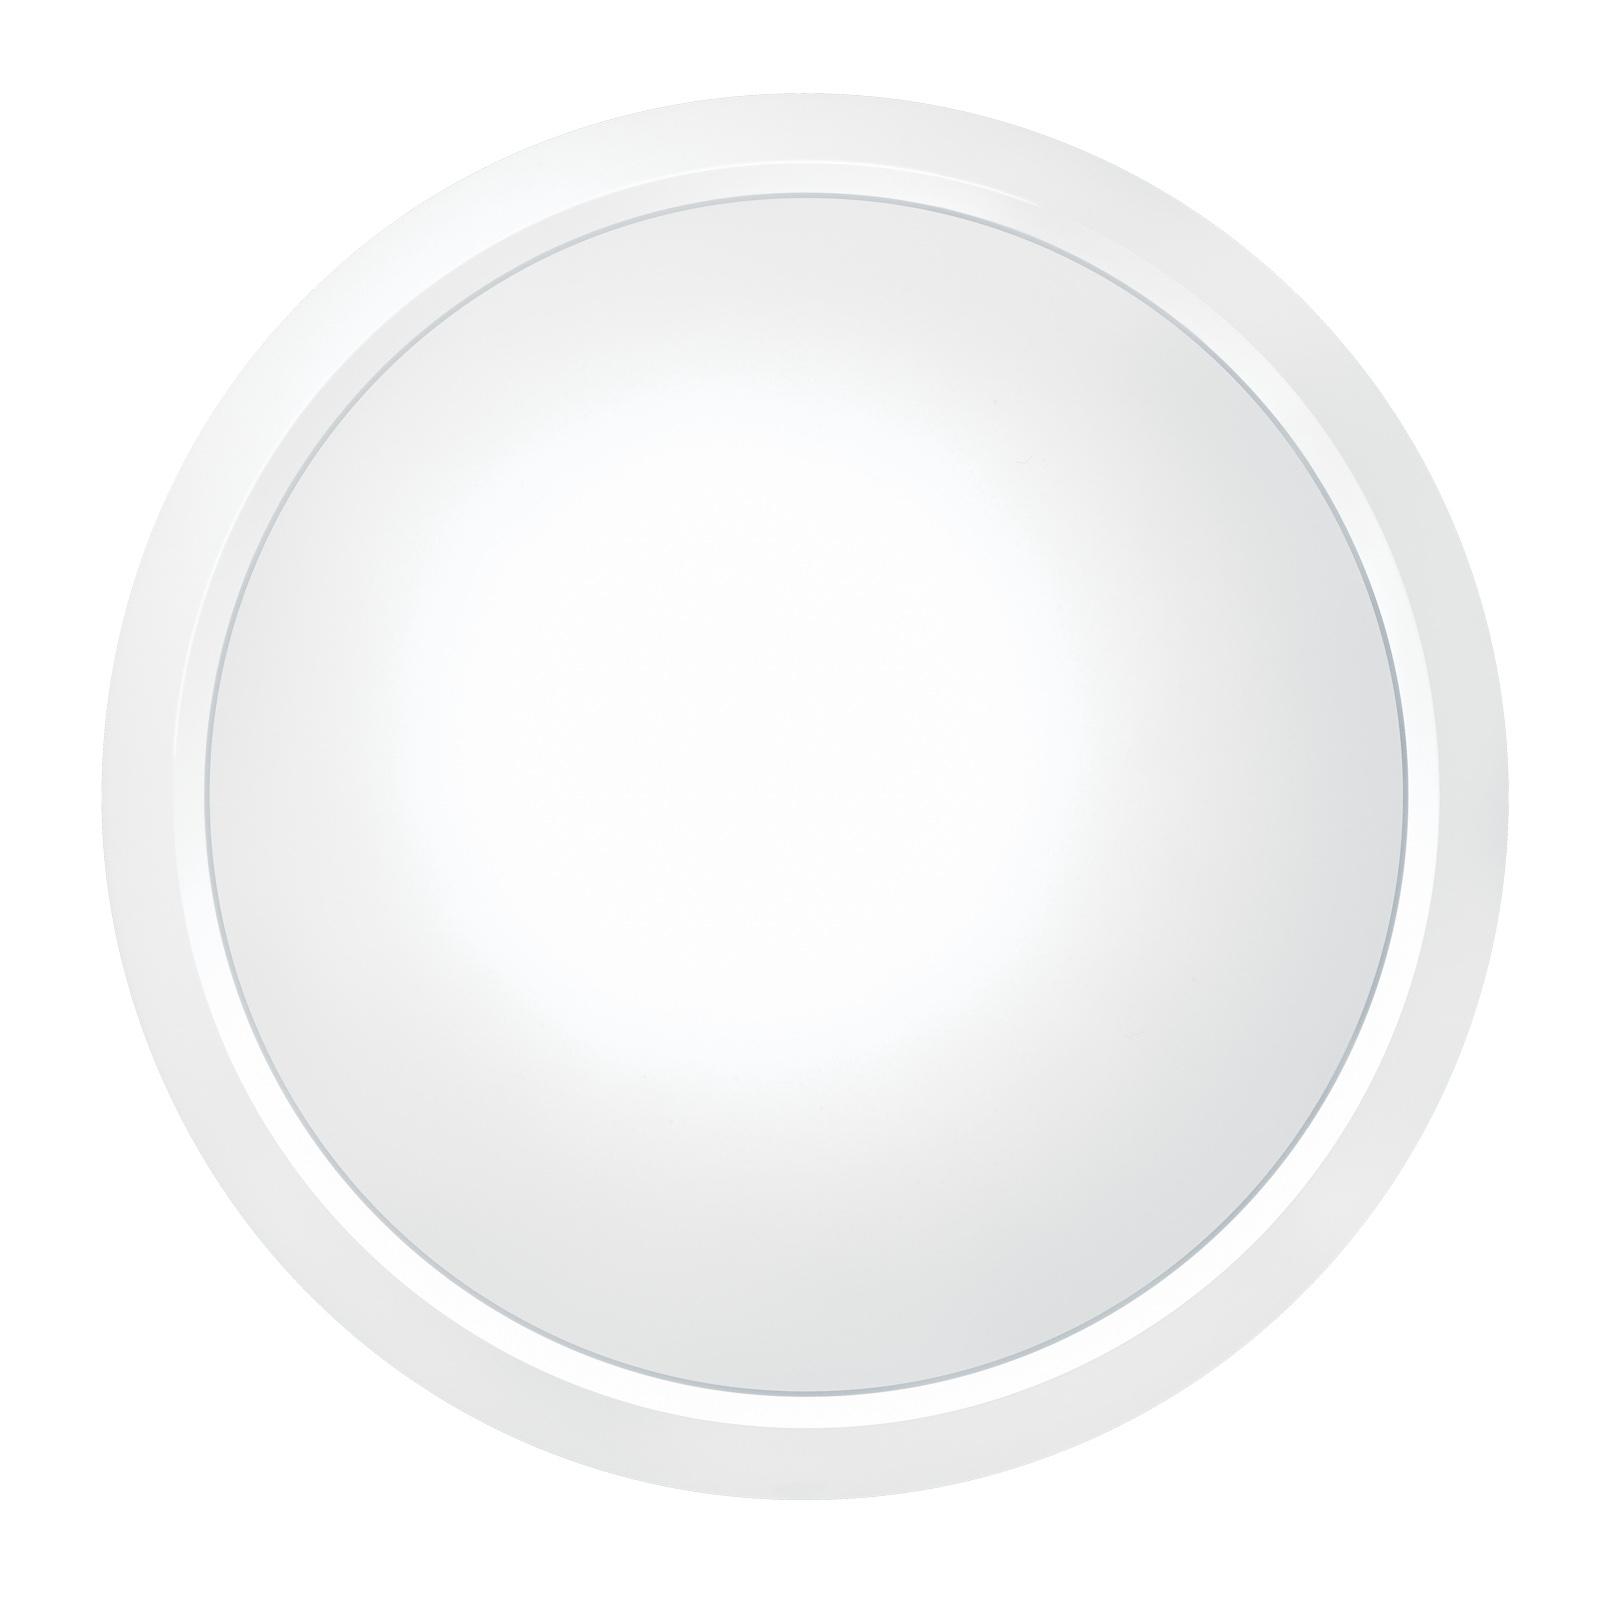 THORNeco Lara LED-Wandleuchte Ø 30cm Dekoring weiß